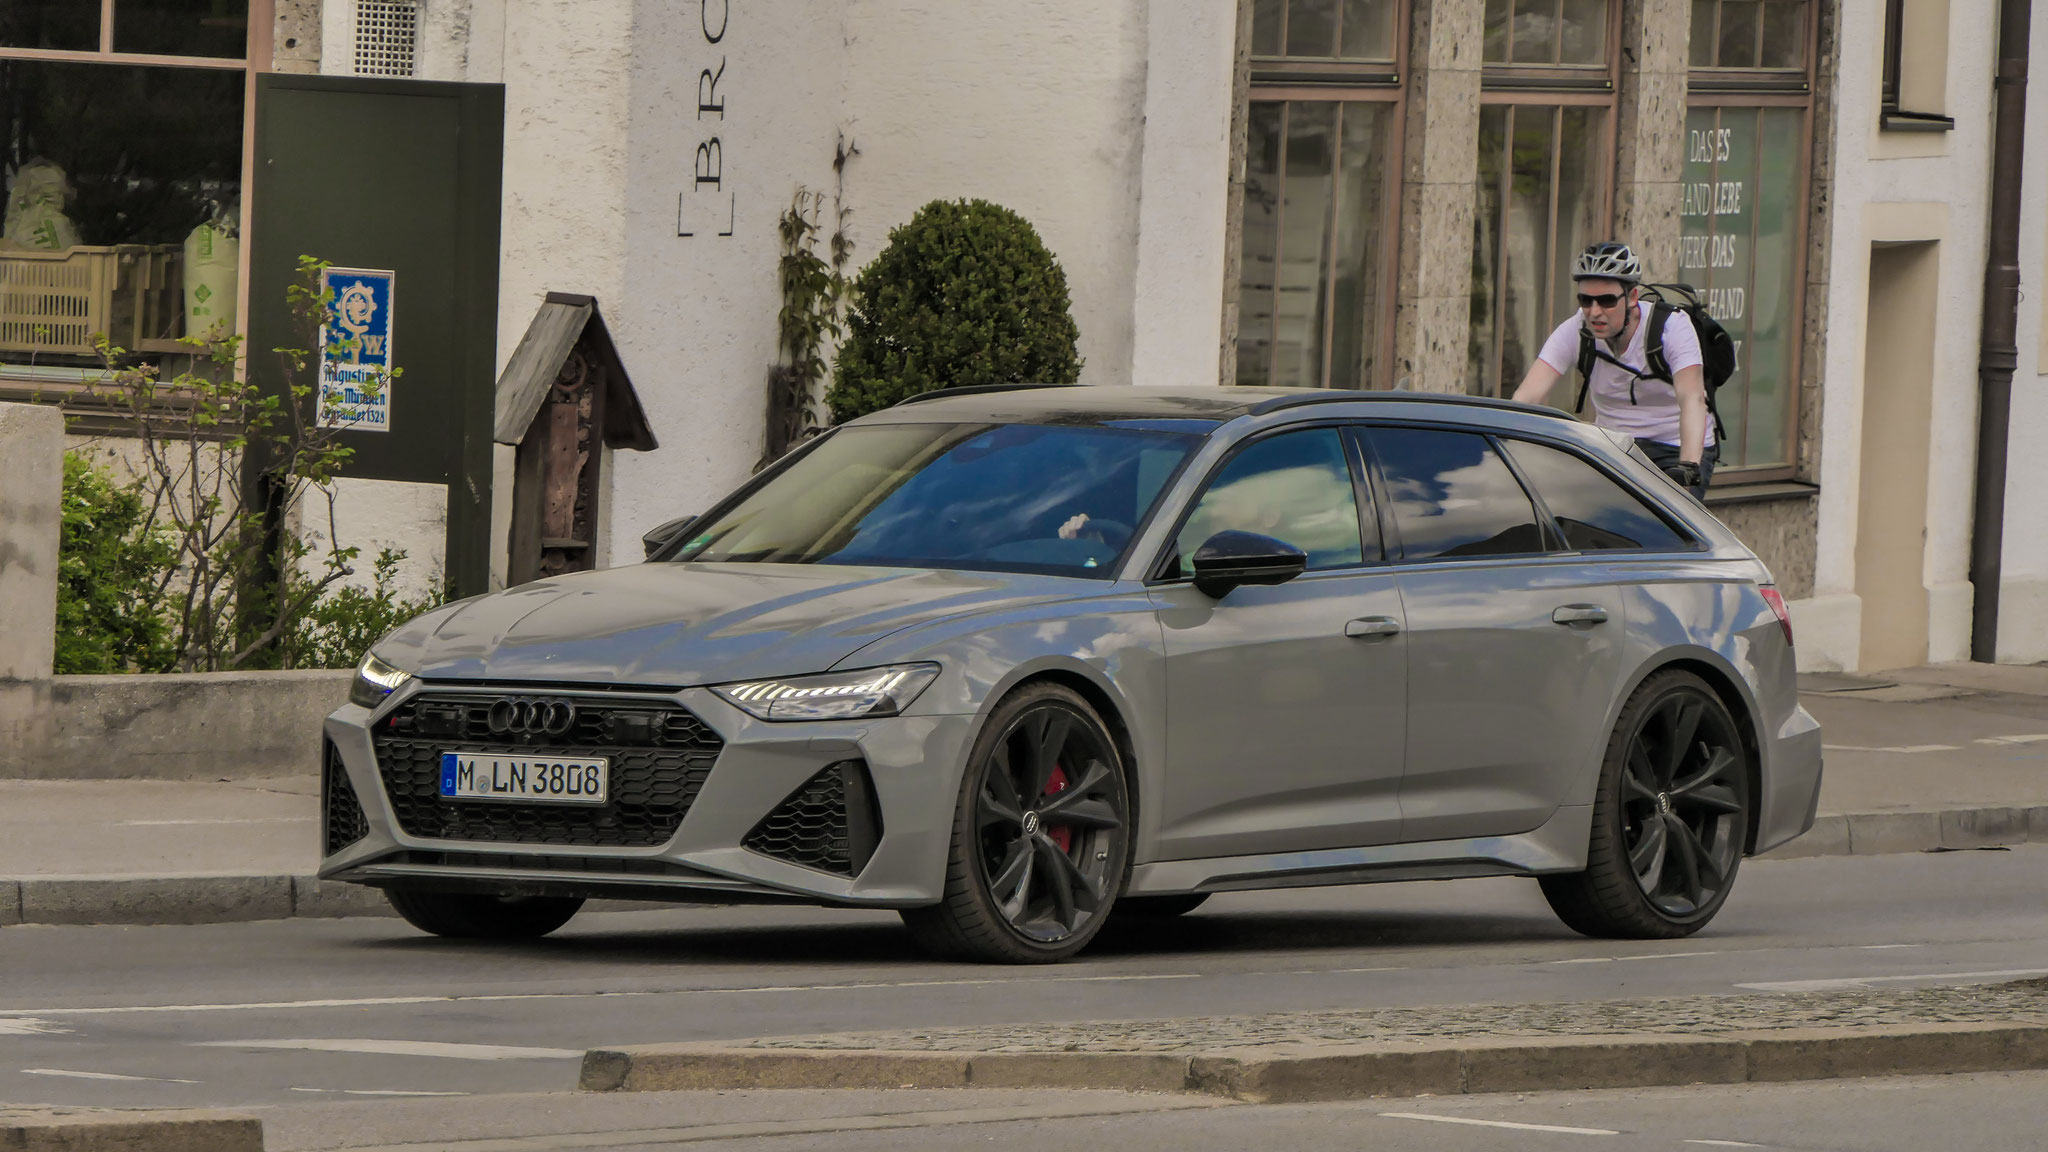 Audi RS6 (Javier Martinez) - M-LN-3808